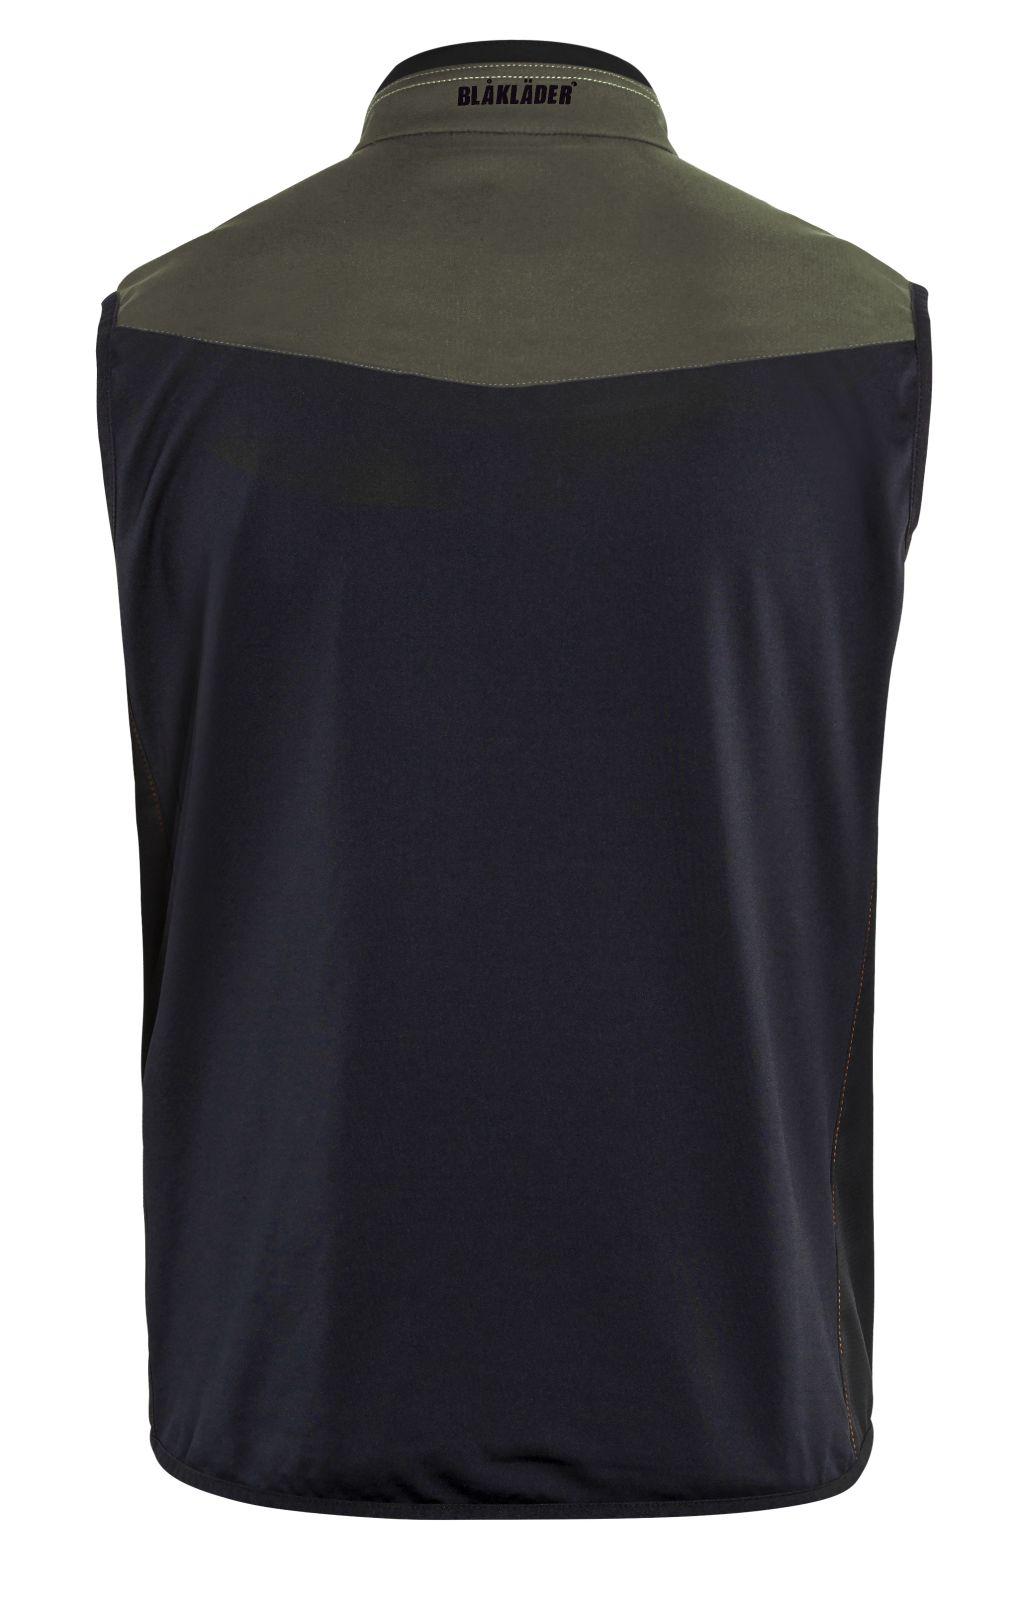 Blaklader Softshell bodywarmers 38502516 groen-zwart(4599)